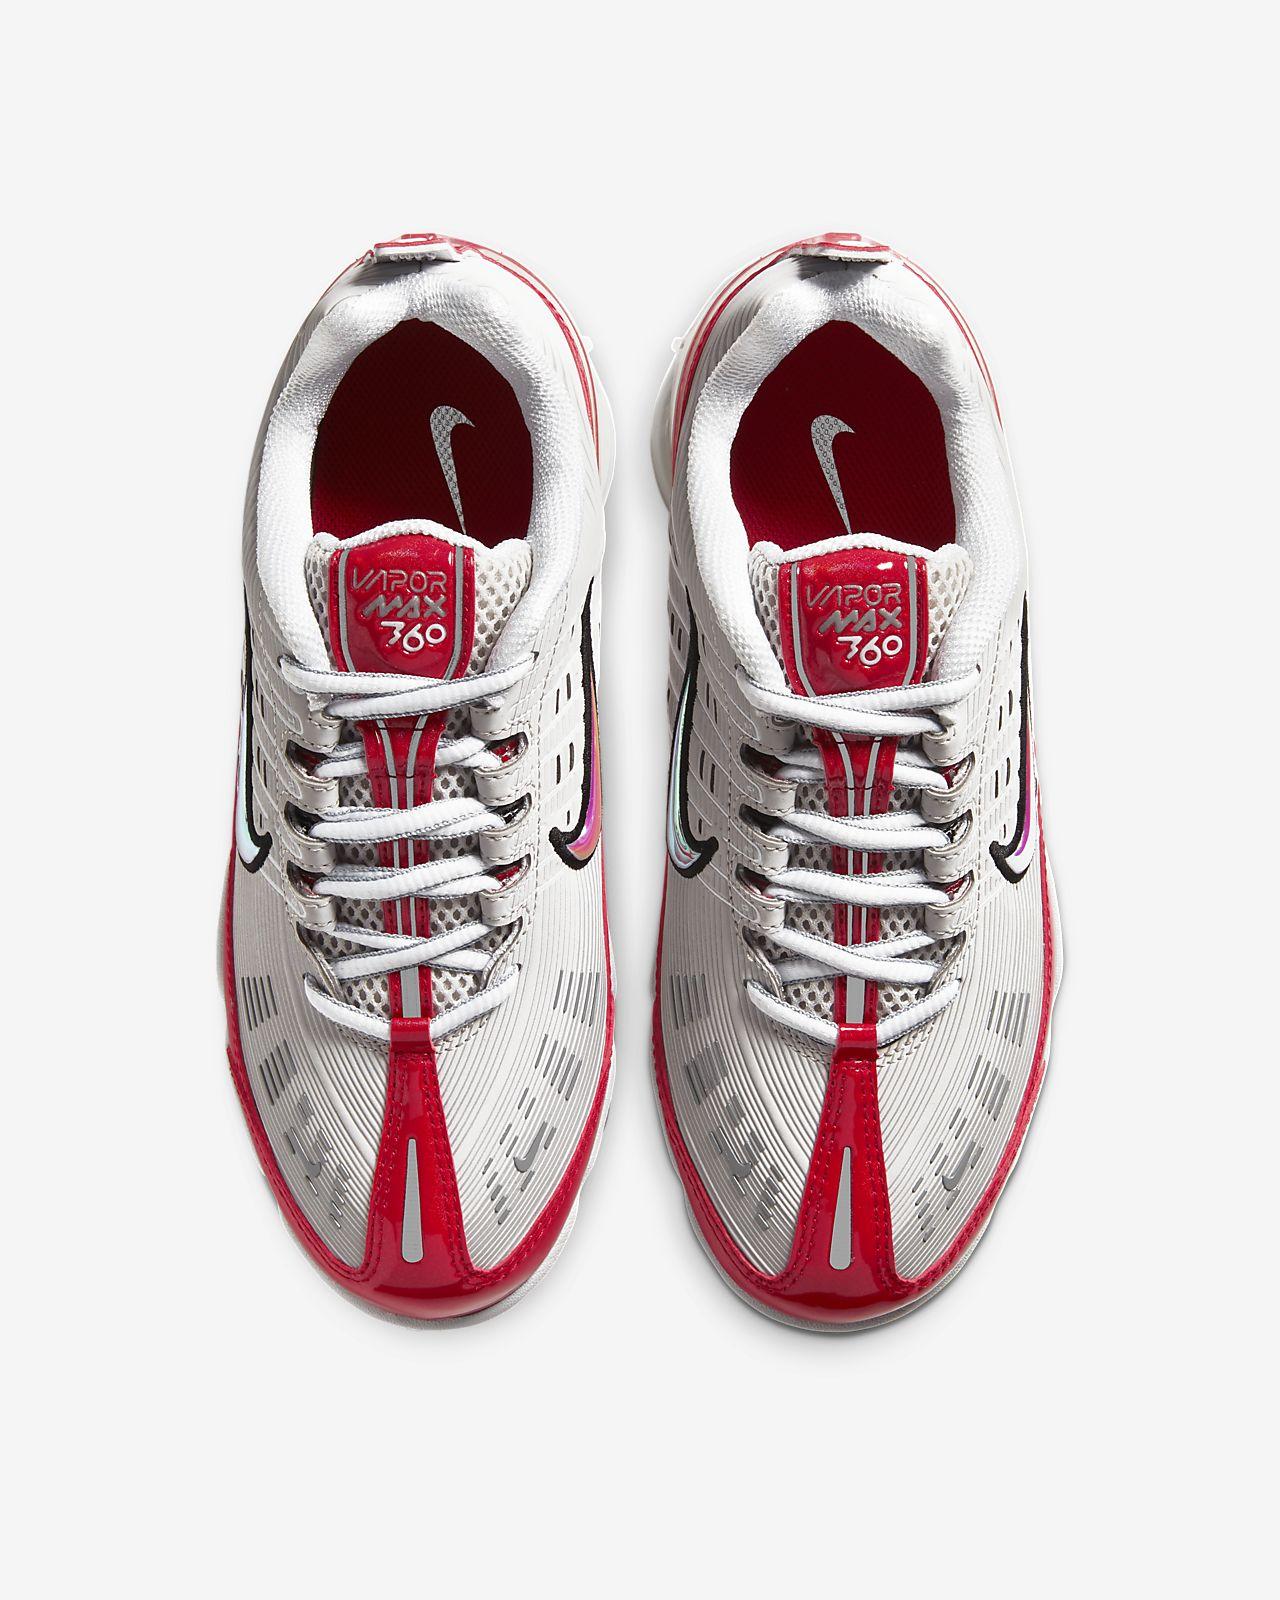 Nike Air VaporMax 360 'Vast GreyParticle Grey' & 'Metallic